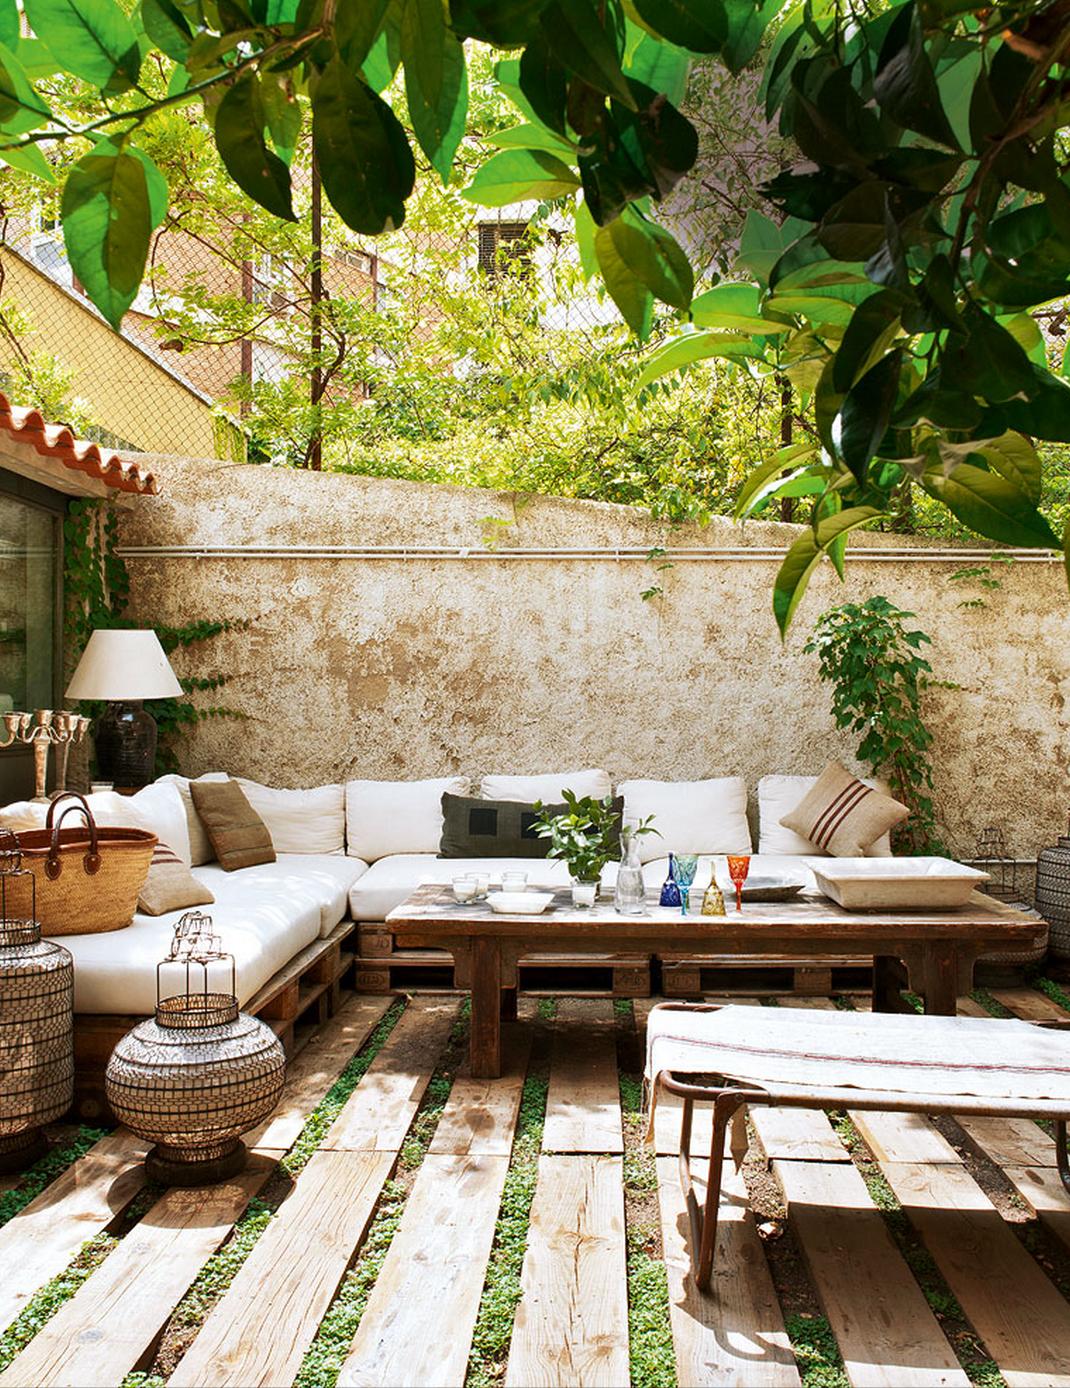 terrasse #cocooning #recup | Projets à essayer | Salon de jardin ...